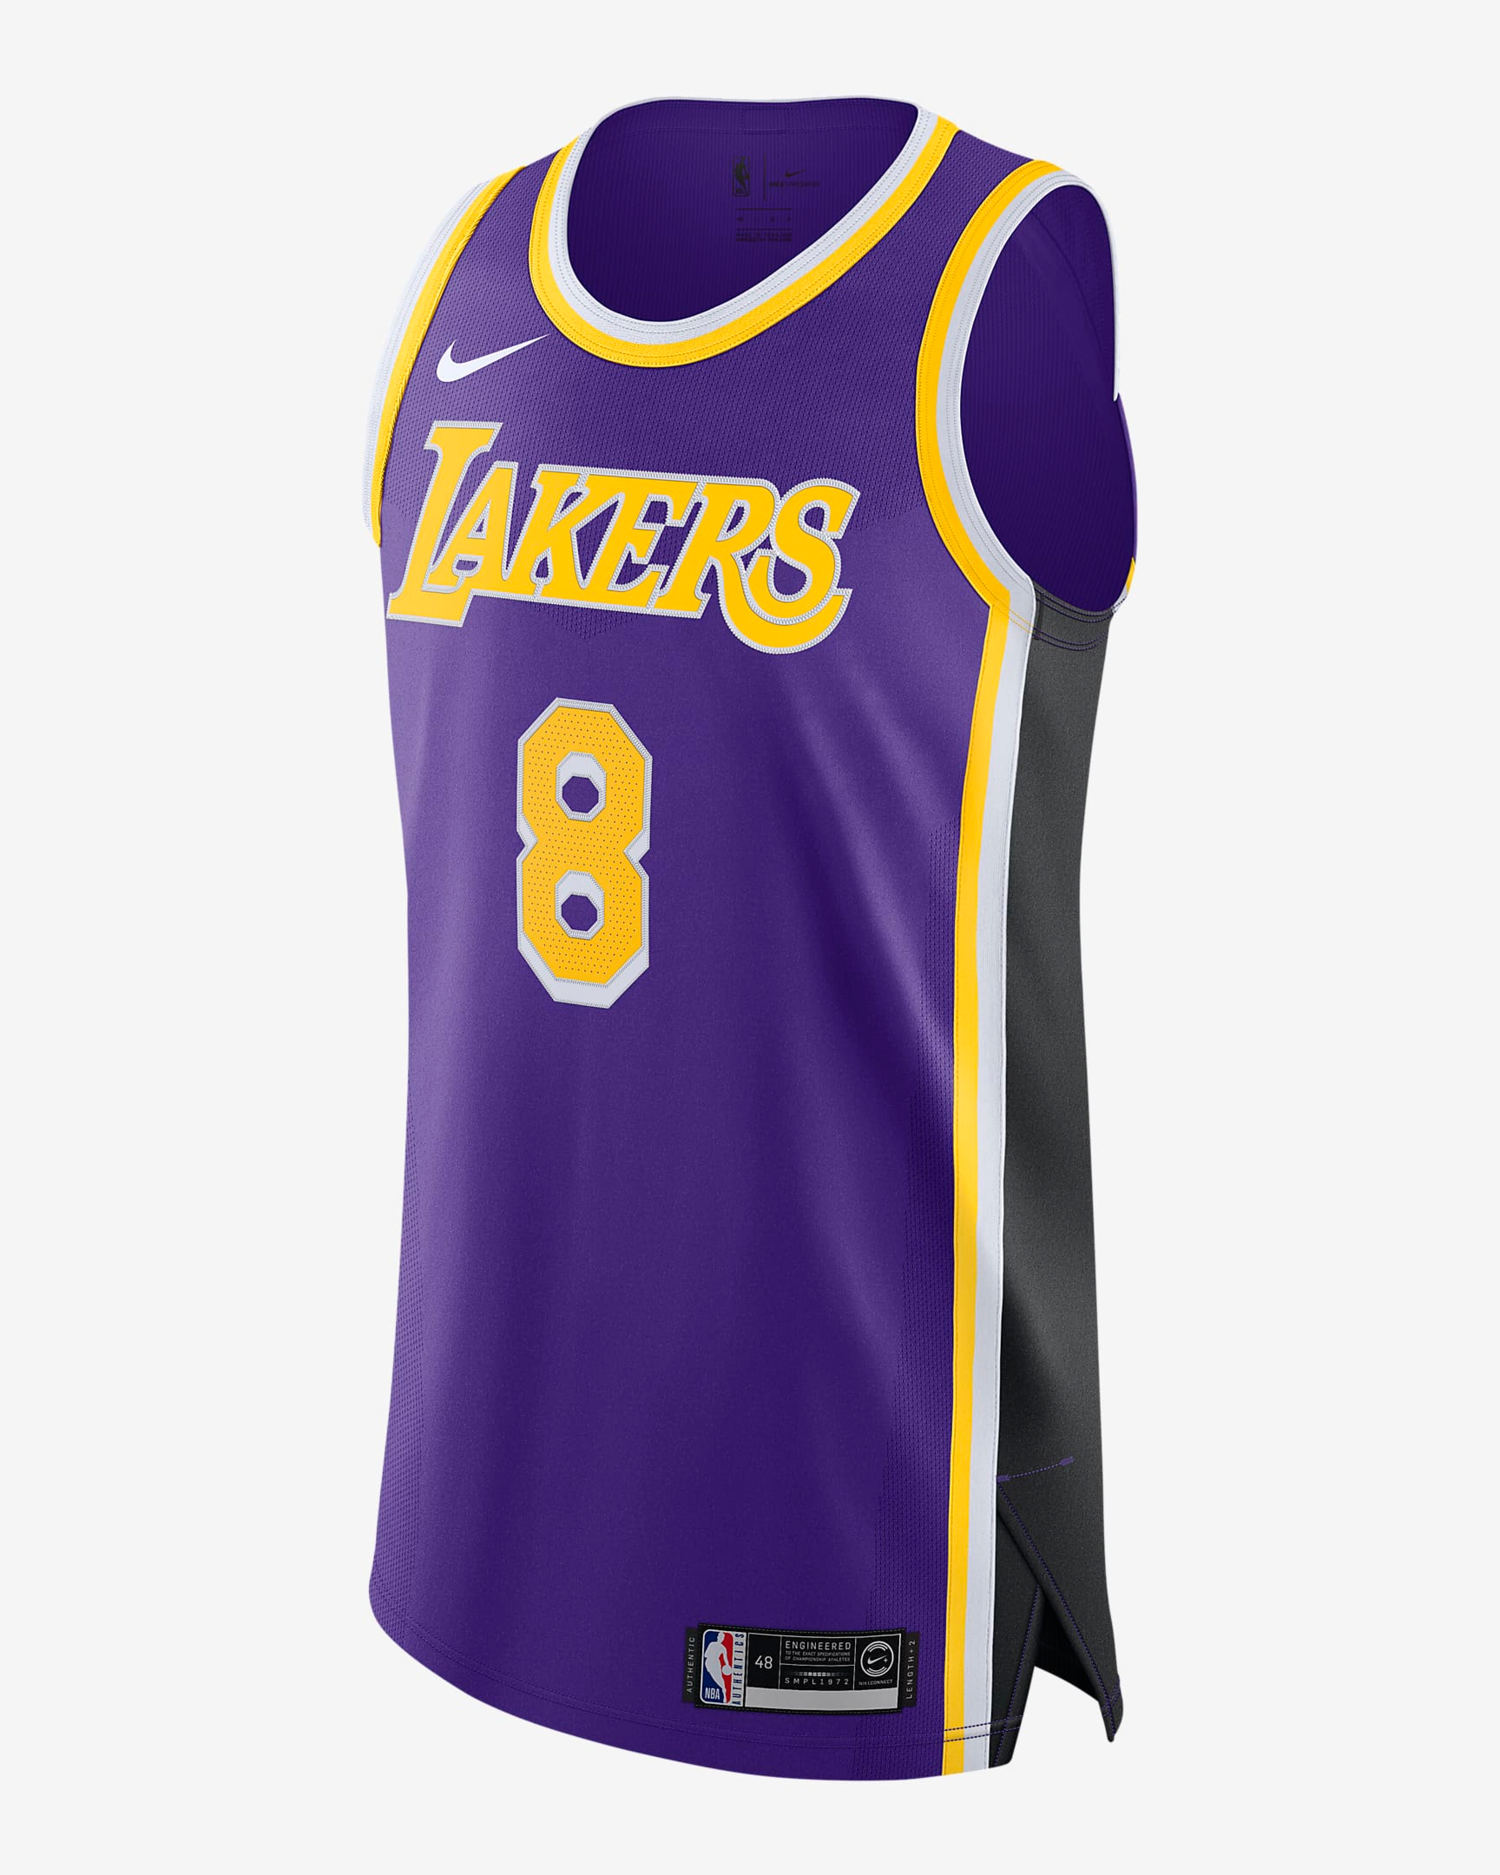 Restock: Nike NBA Kobe Bryant Lakers Statement Jersey — Sneaker Shouts